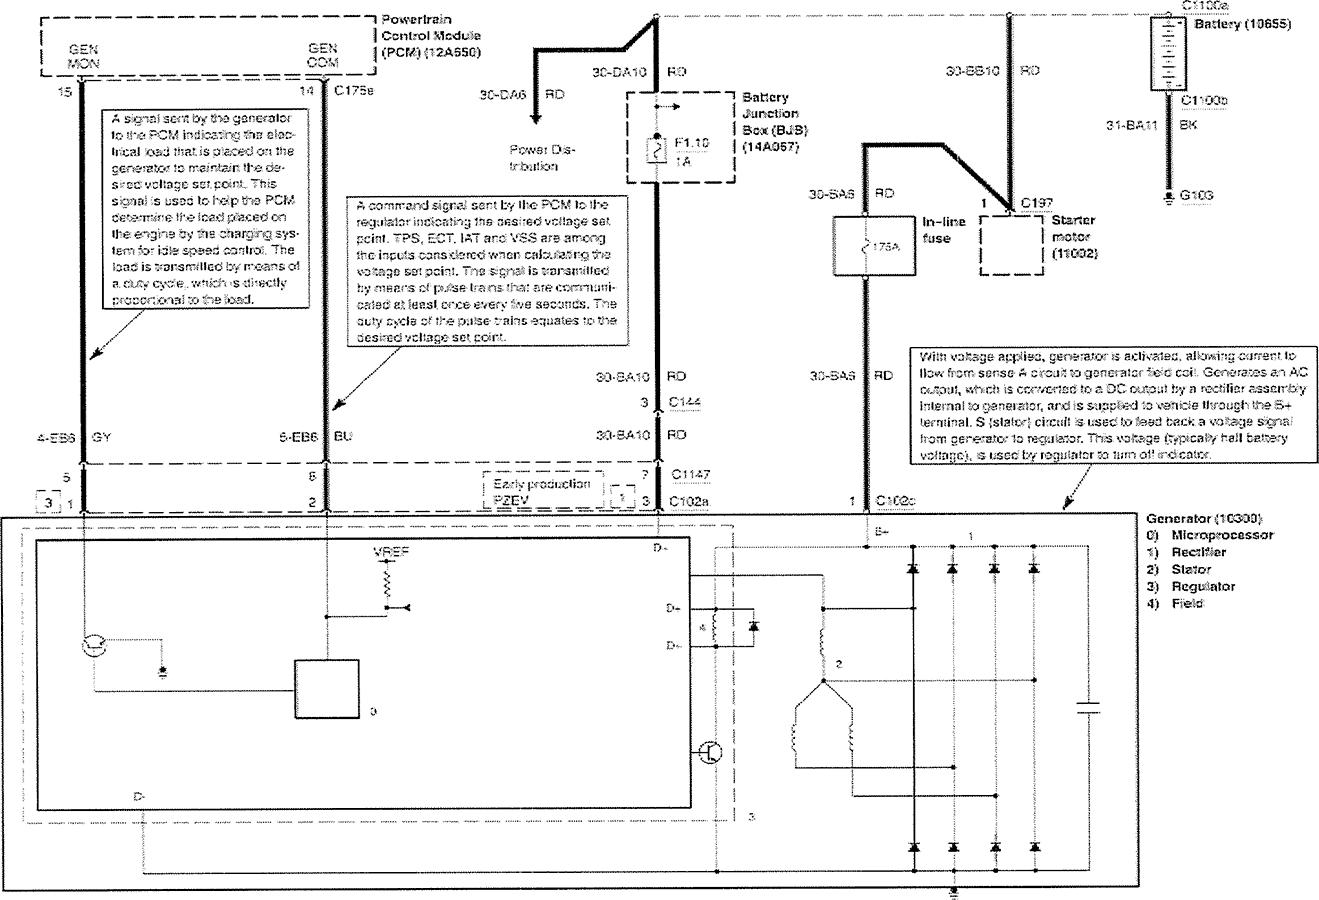 ford focus alternator magneti marelli 63321678 jakie diody ford focus alternator magneti marelli 63321678 jakie diody prostownicze